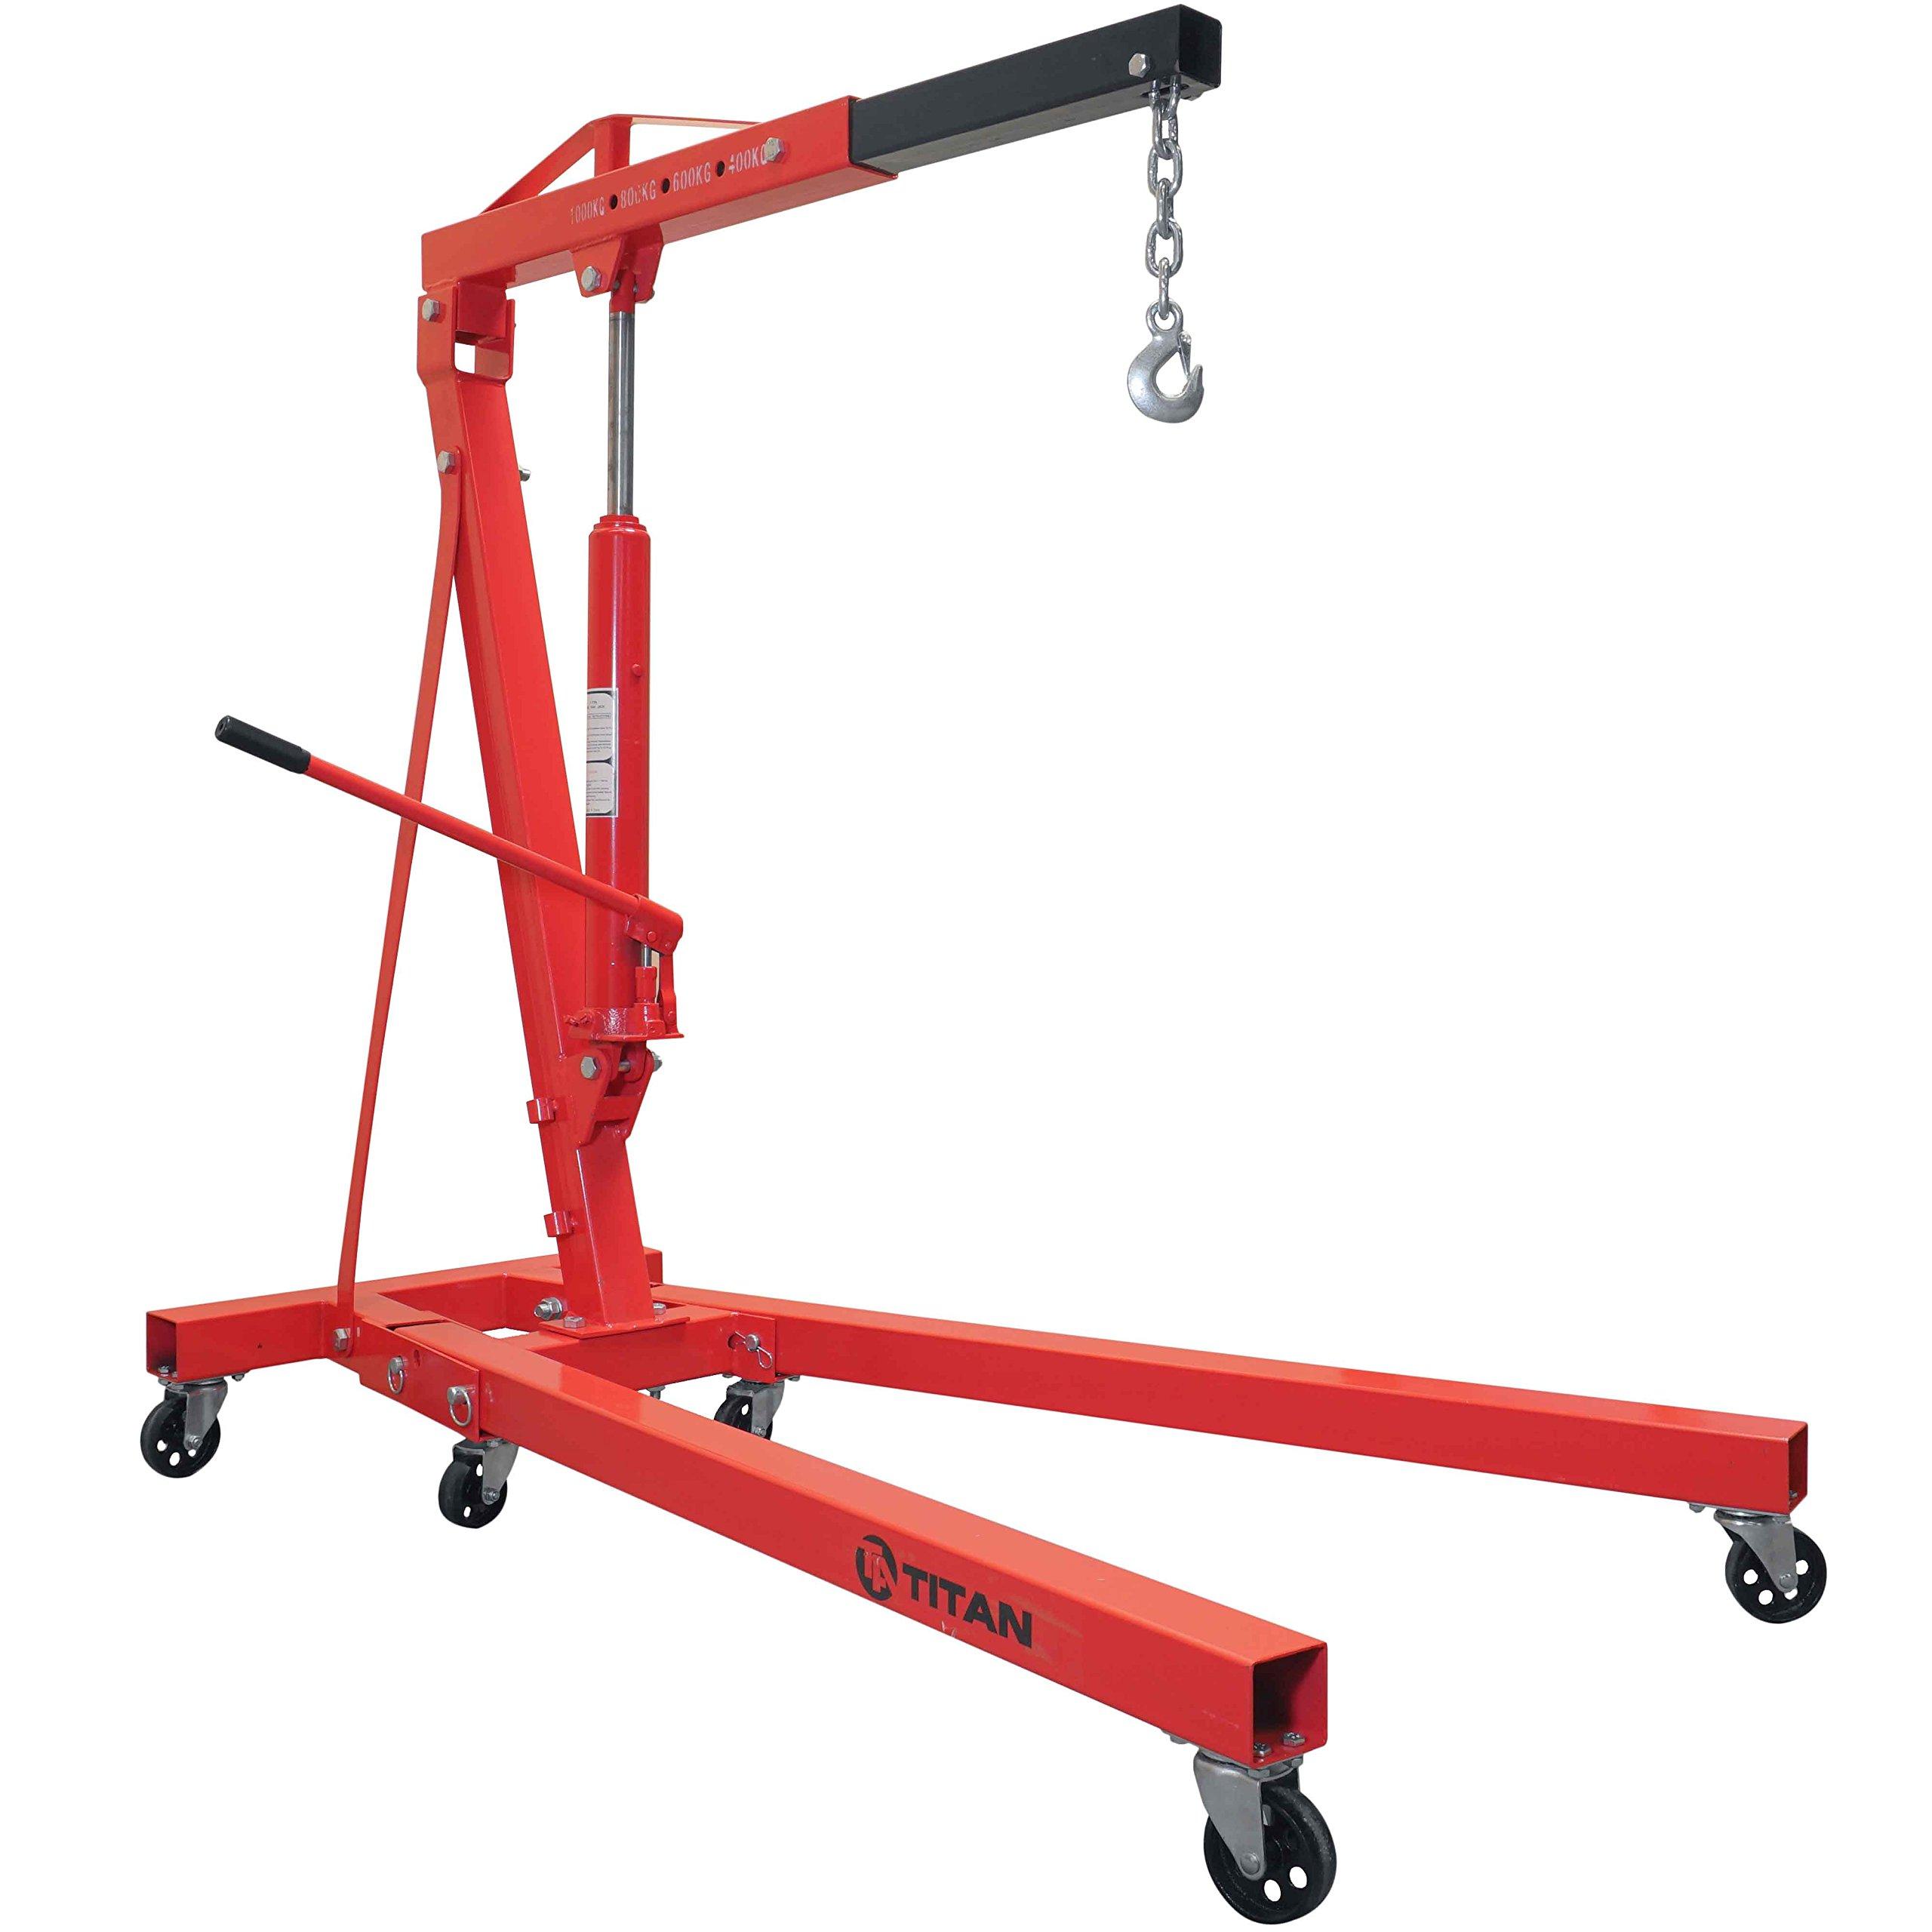 Titan Attachments 1 Ton Steel Shop Crane Adjustable Height Cherry Picker Lift by Titan Attachments